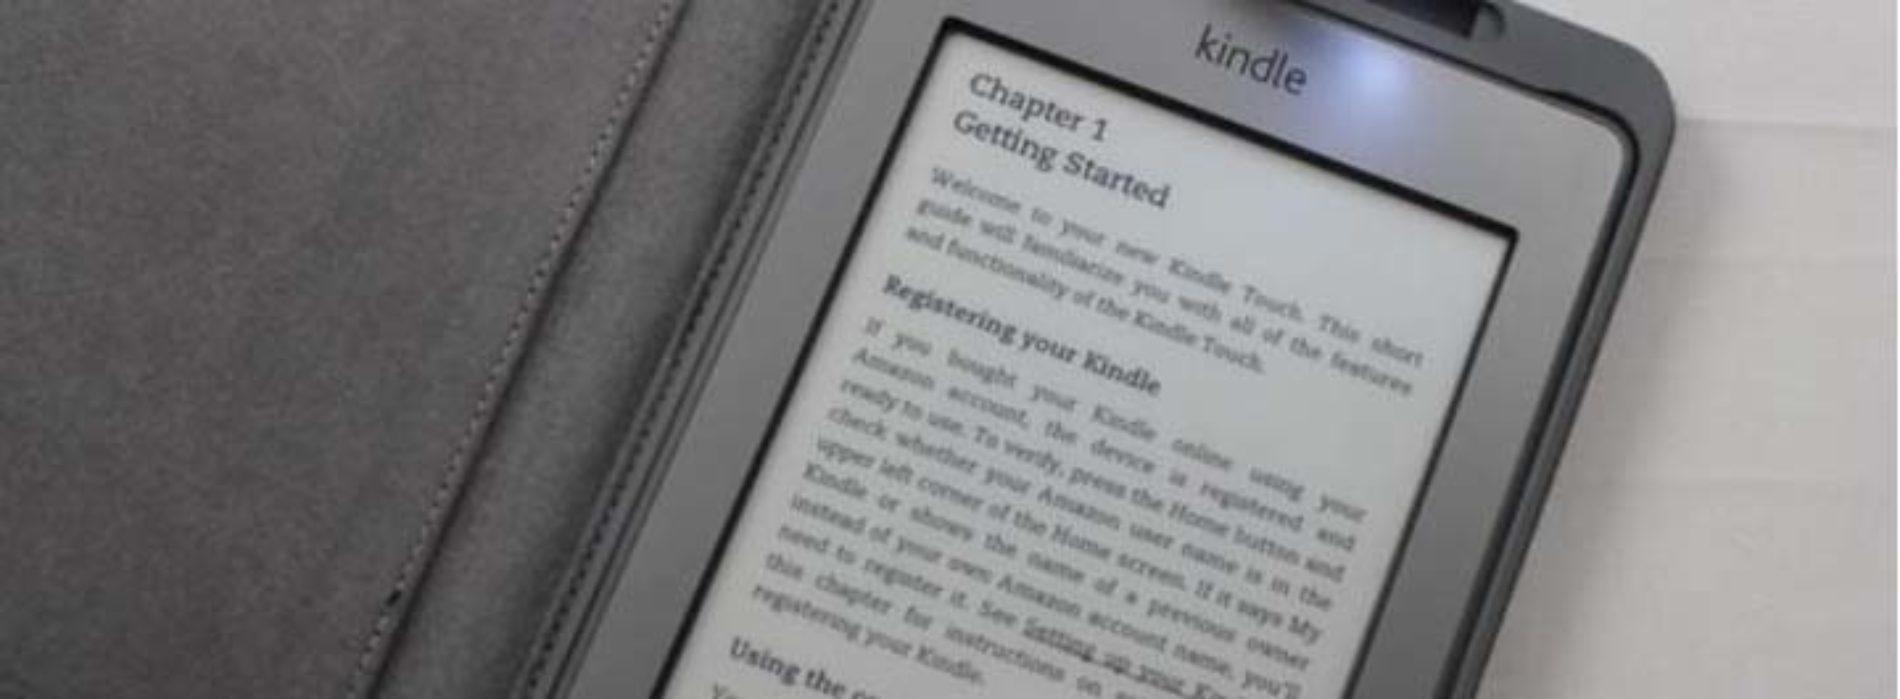 Замена экрана электронной книги Amazon Kindle 4